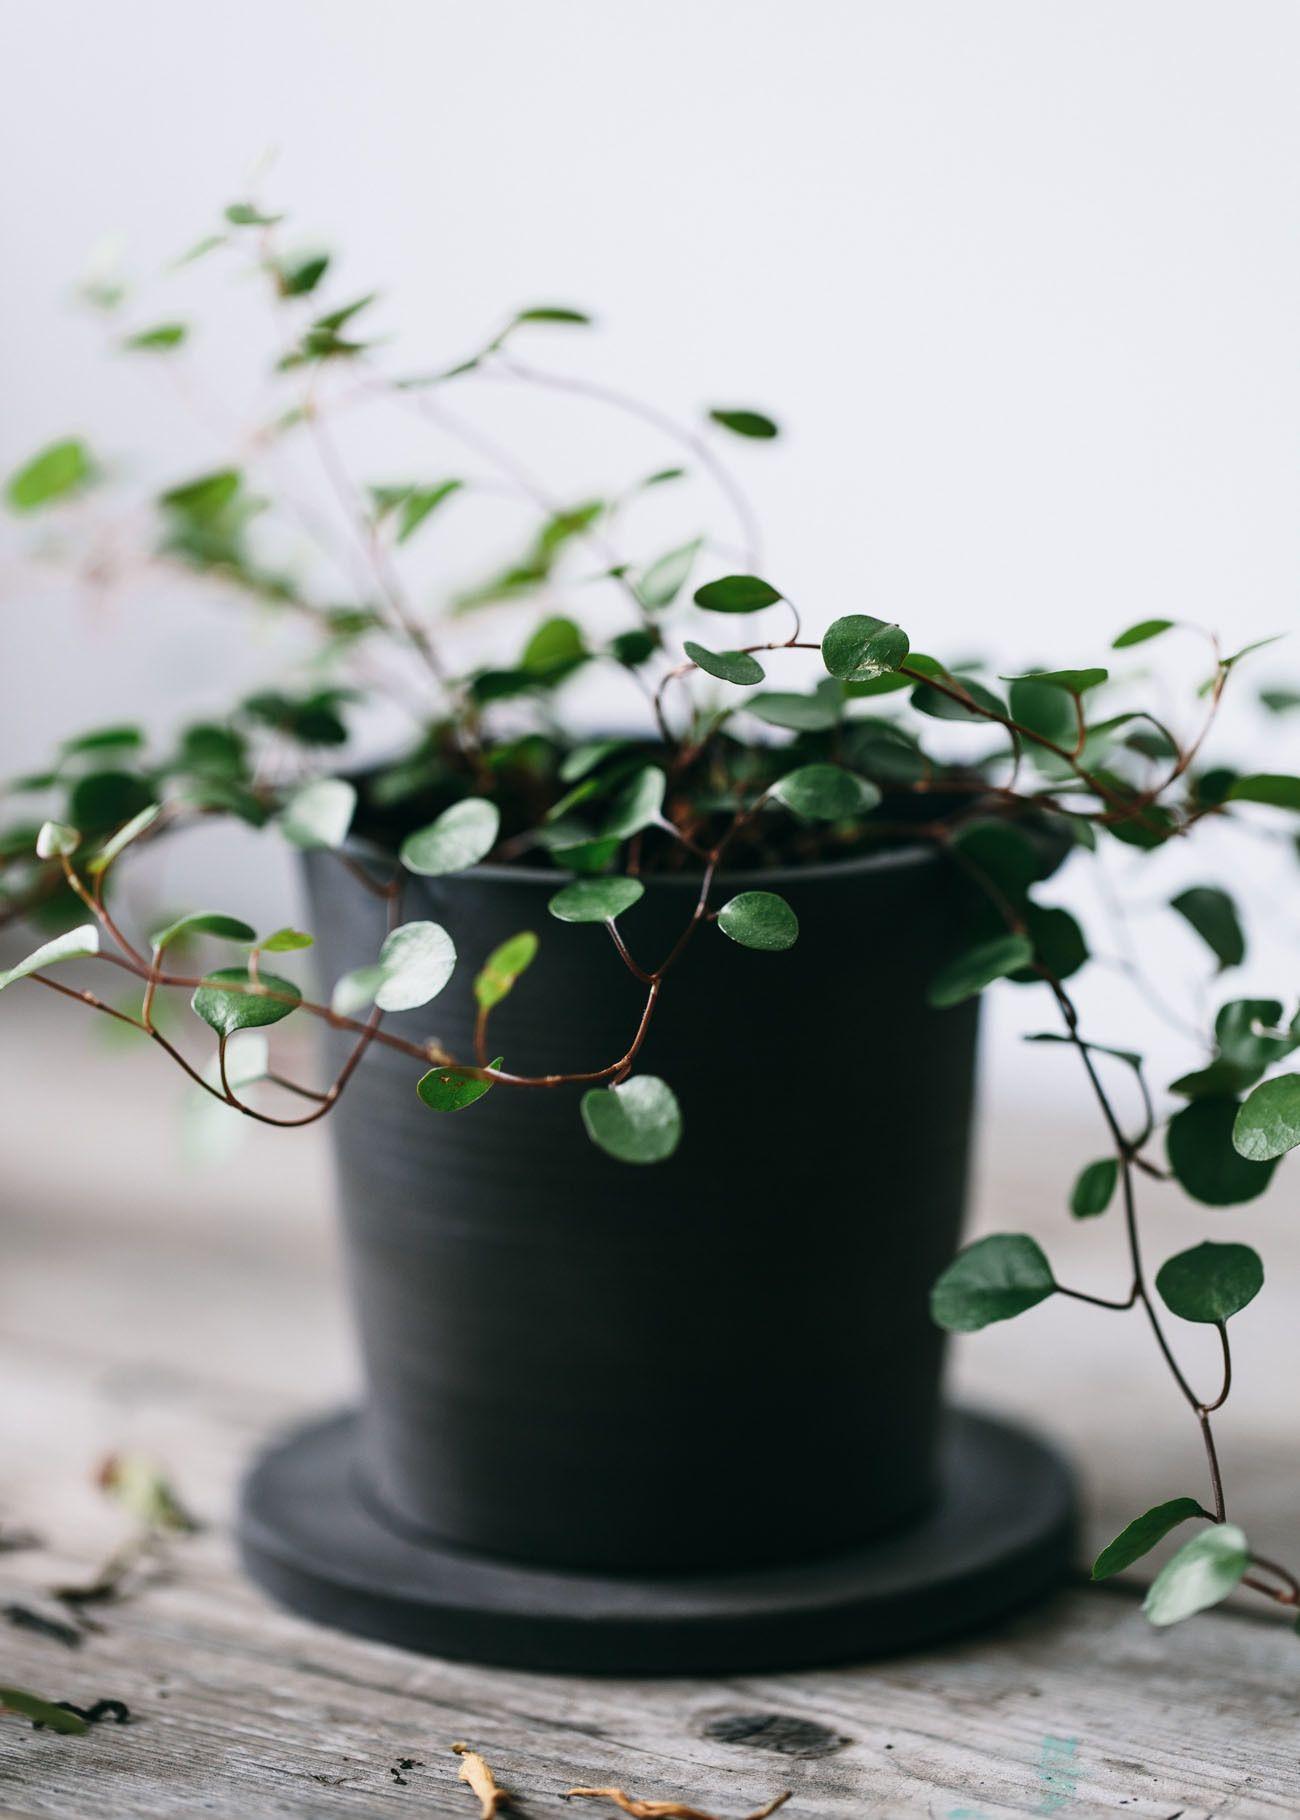 Black Ceramics And Green Plants Dream Team Plants 400 x 300